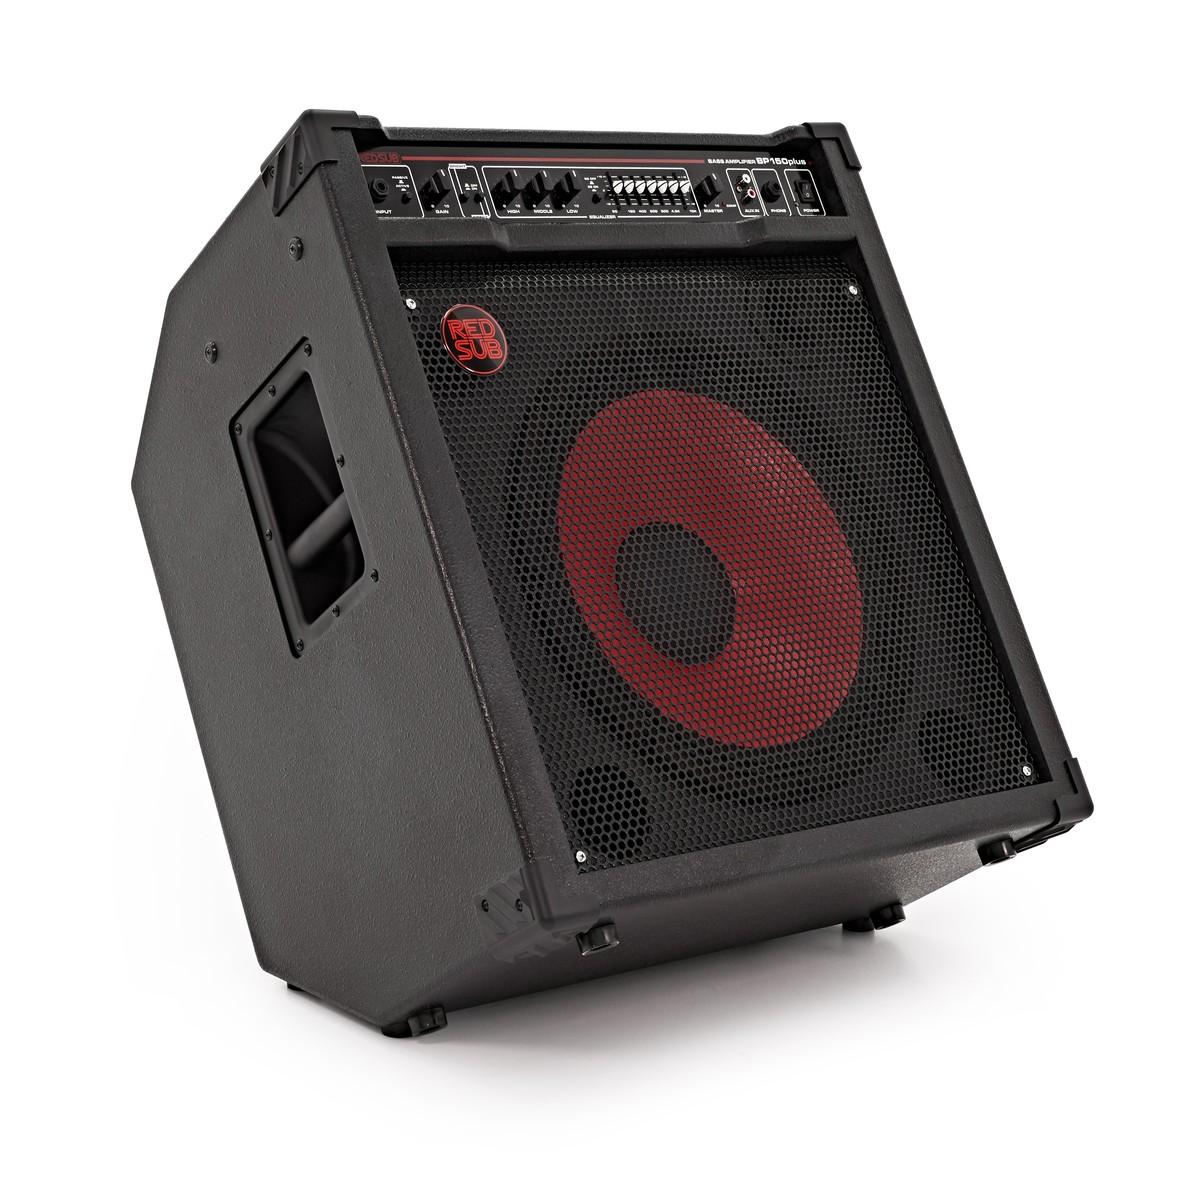 redsub bp150plus 150w bass guitar amplifier at gear4music. Black Bedroom Furniture Sets. Home Design Ideas